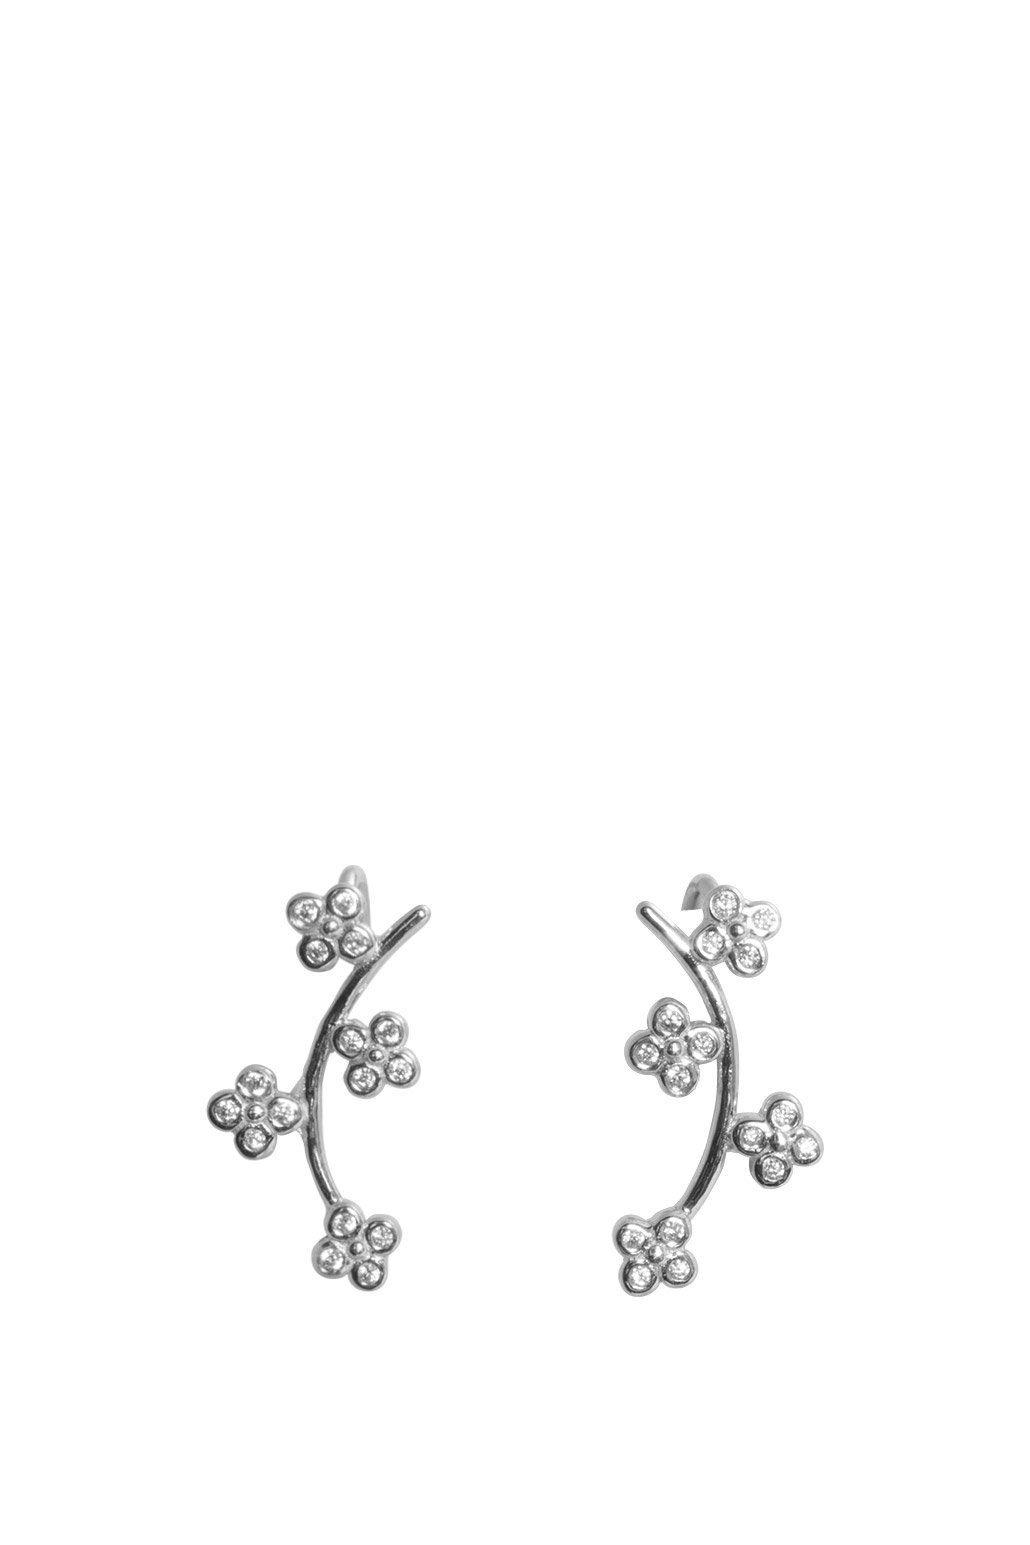 ESPRIT CASUAL 925 Sterling Silber / Zirkonia Ear Climber